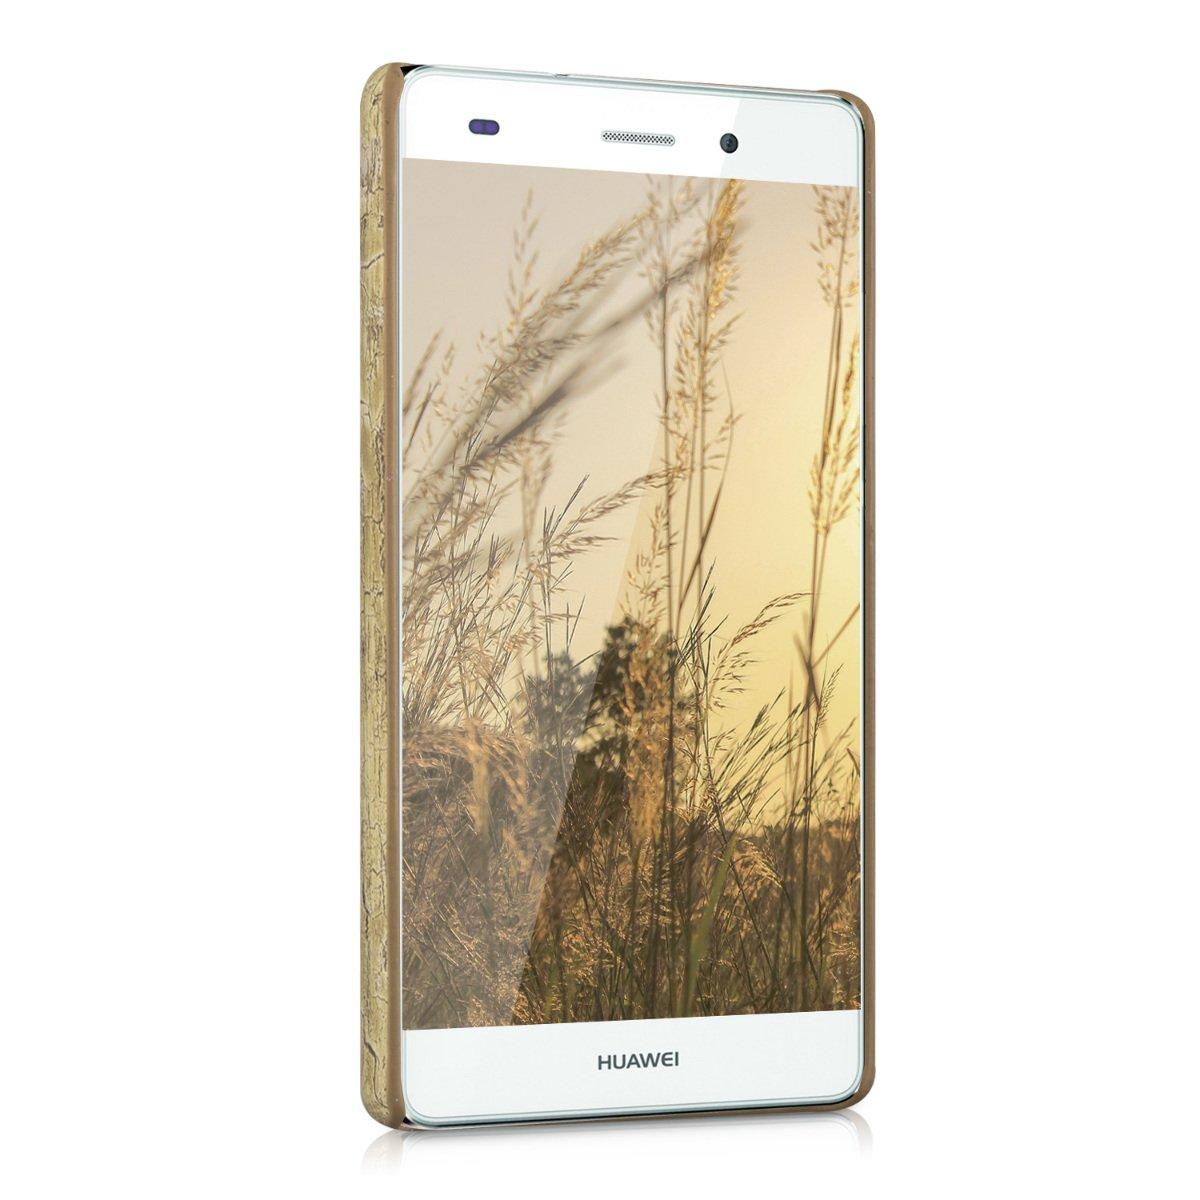 Amazon.com: Kwmobile - Carcasa rígida para Huawei P8 Lite ...